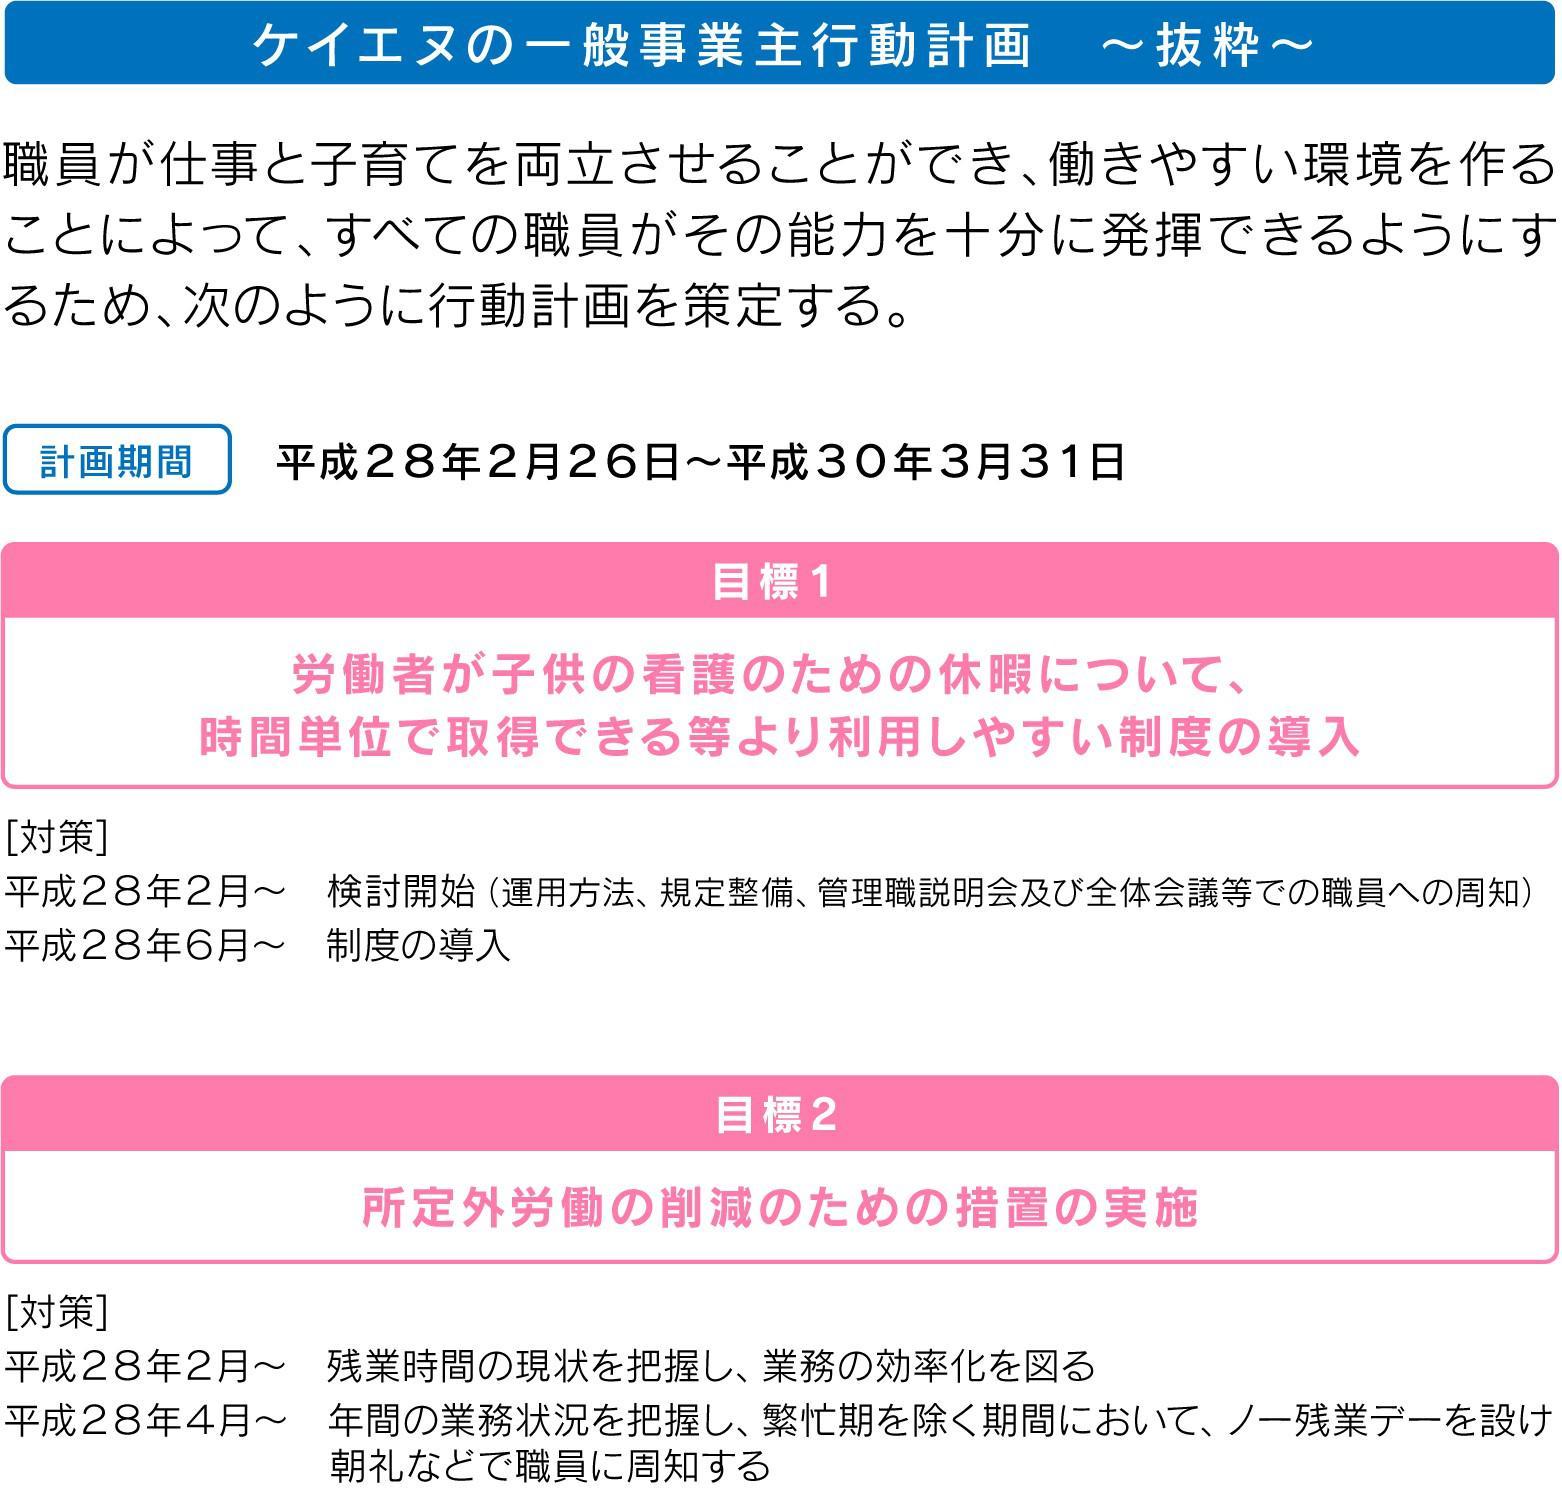 http://hint-hiroshima.com/keiei/upload/type2_knc_4.jpg